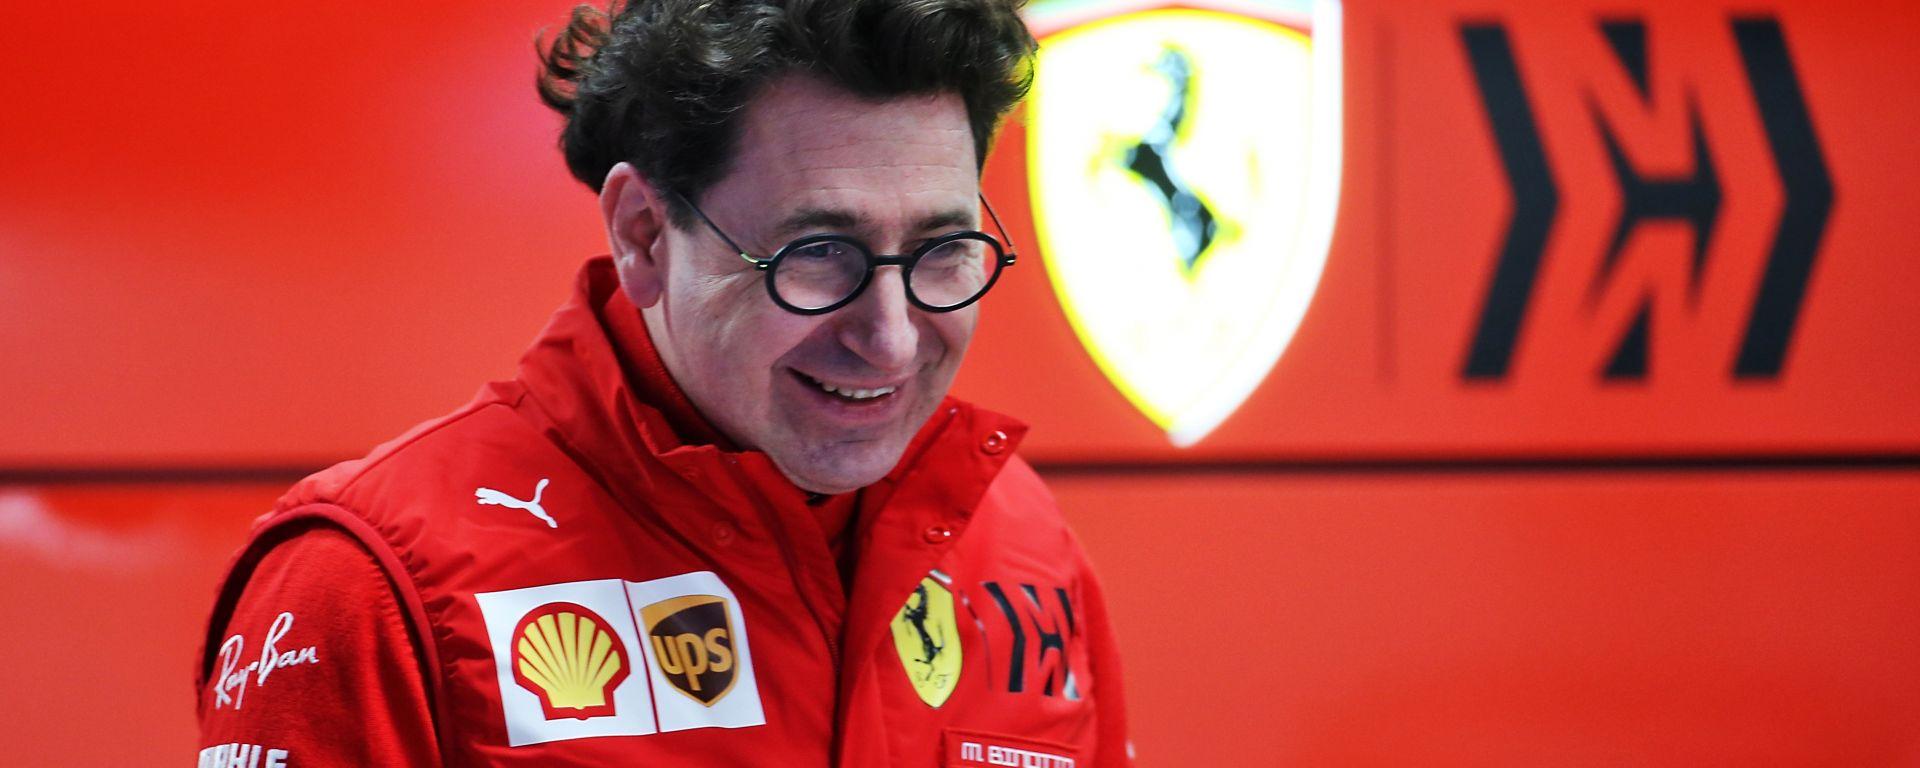 F1 Testing 2020: Mattia Binotto (Ferrari)